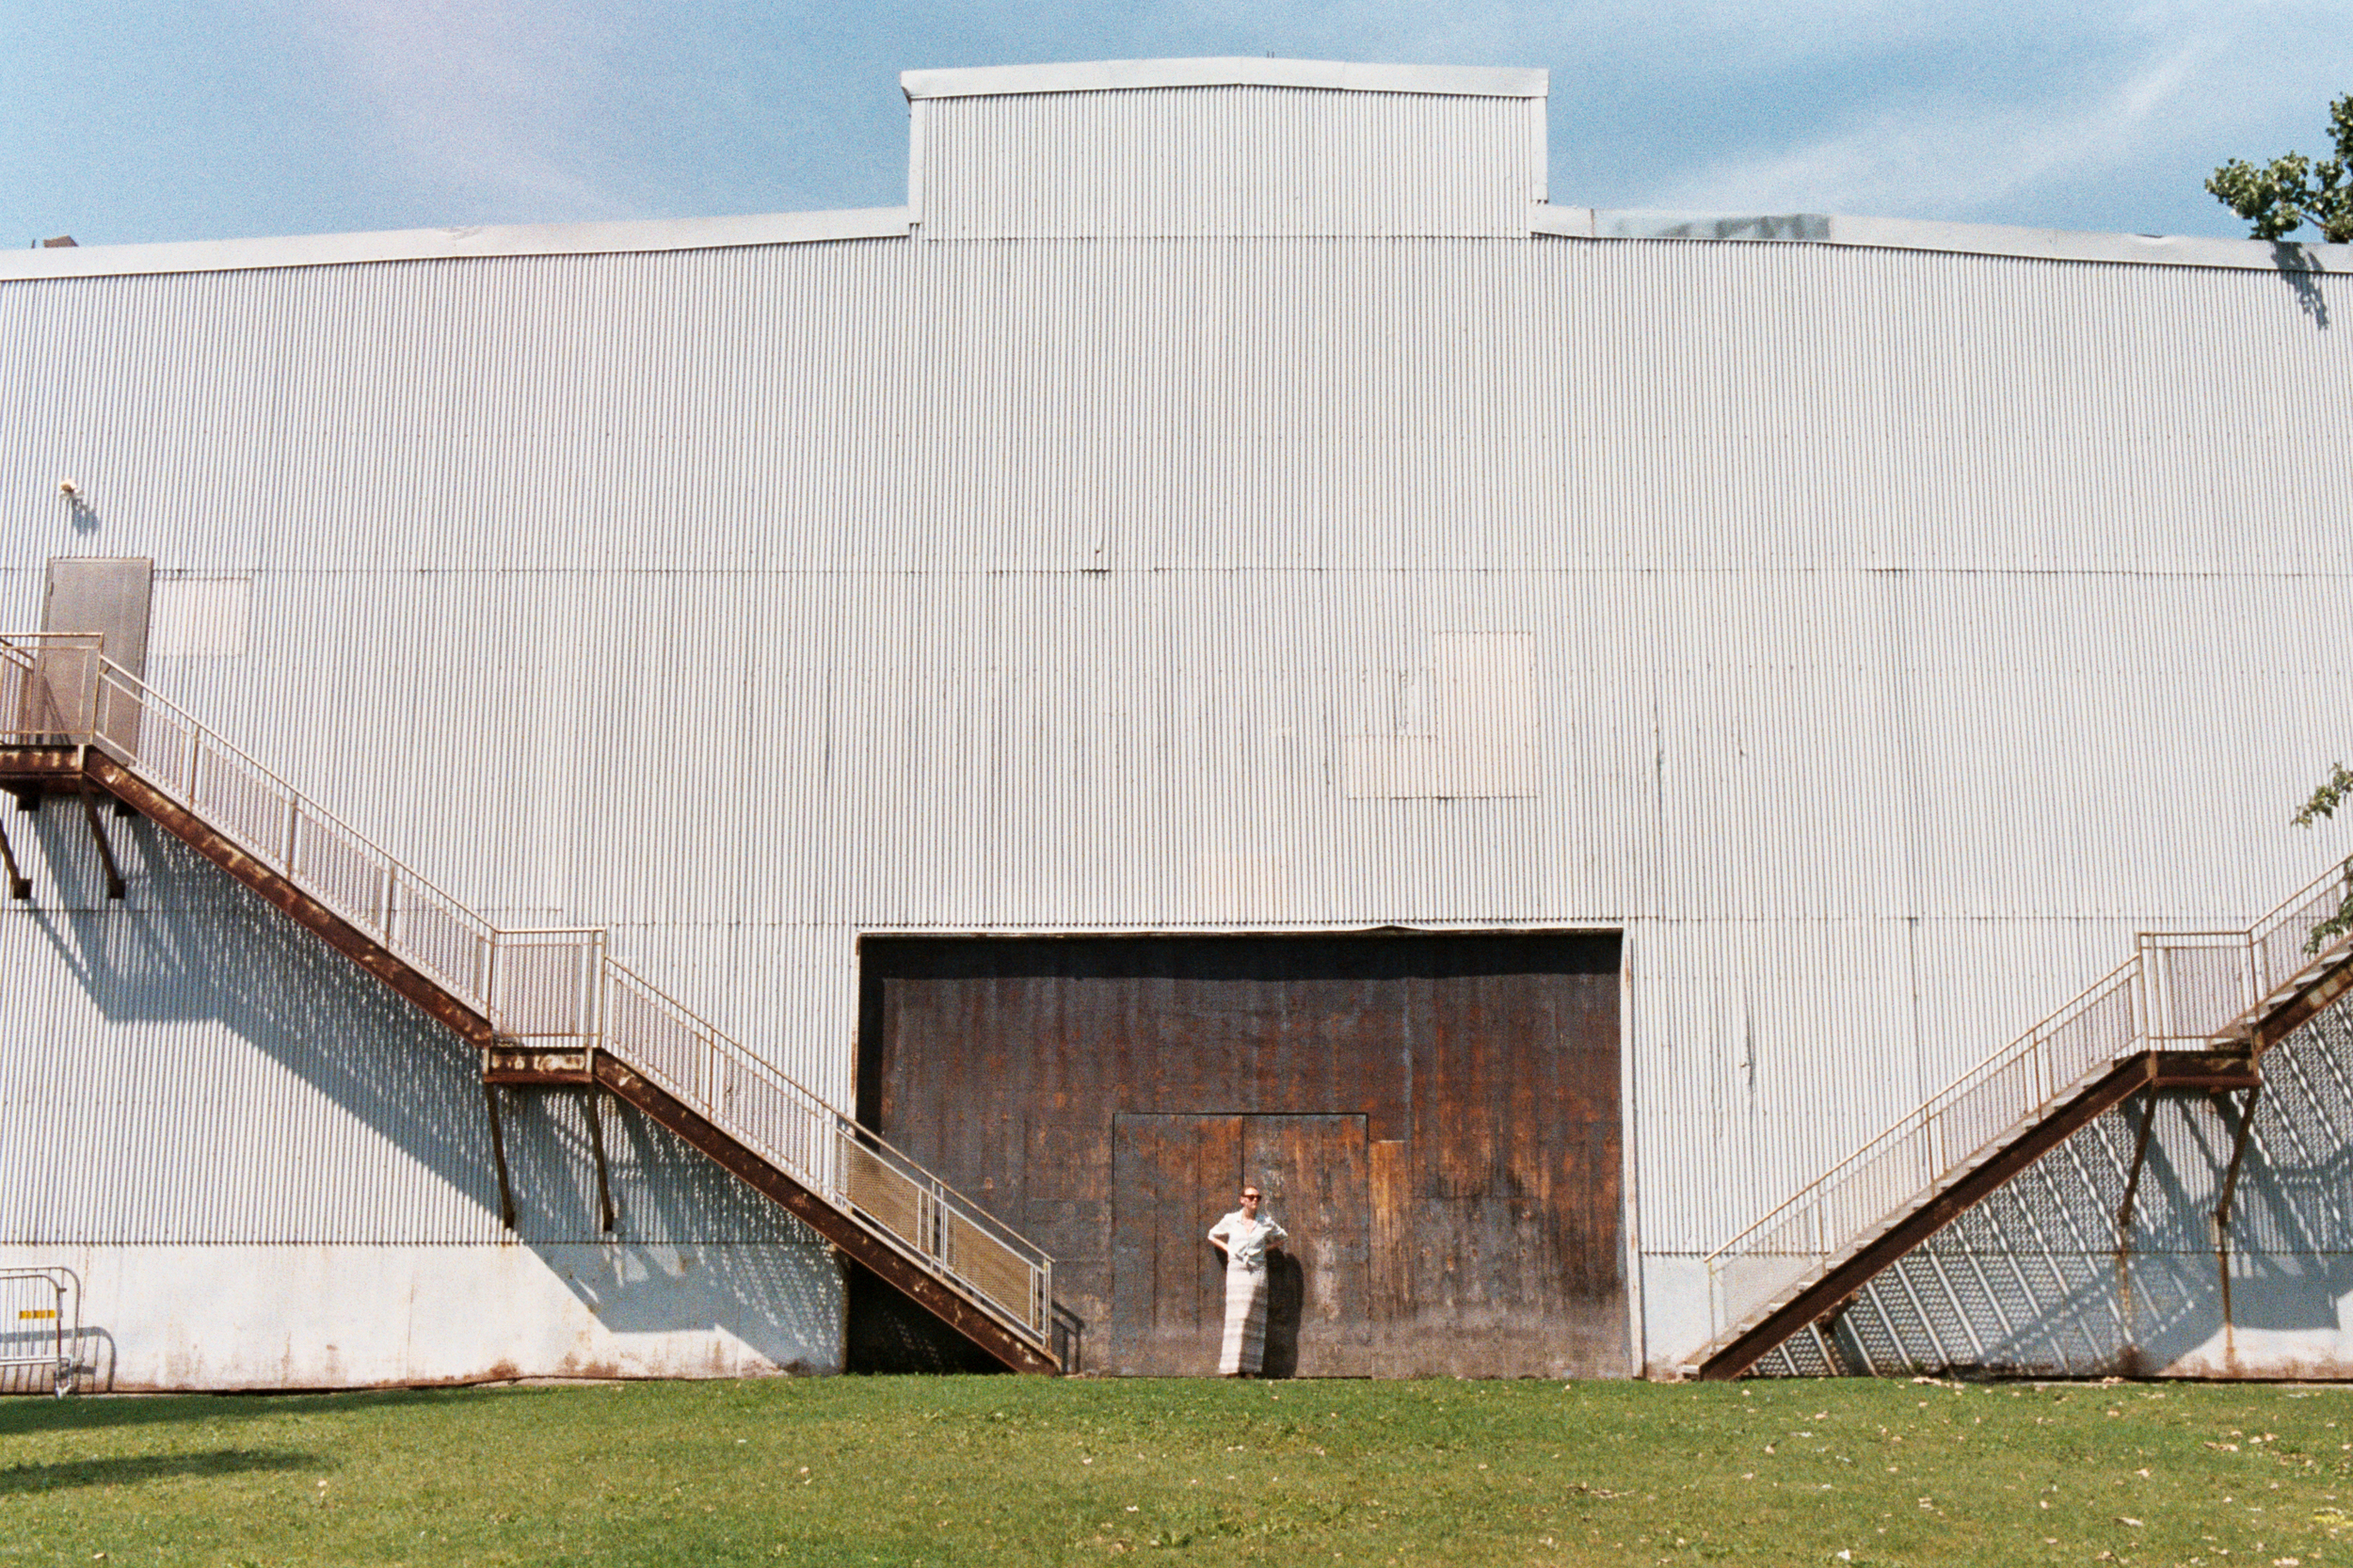 montreal-0031.jpg